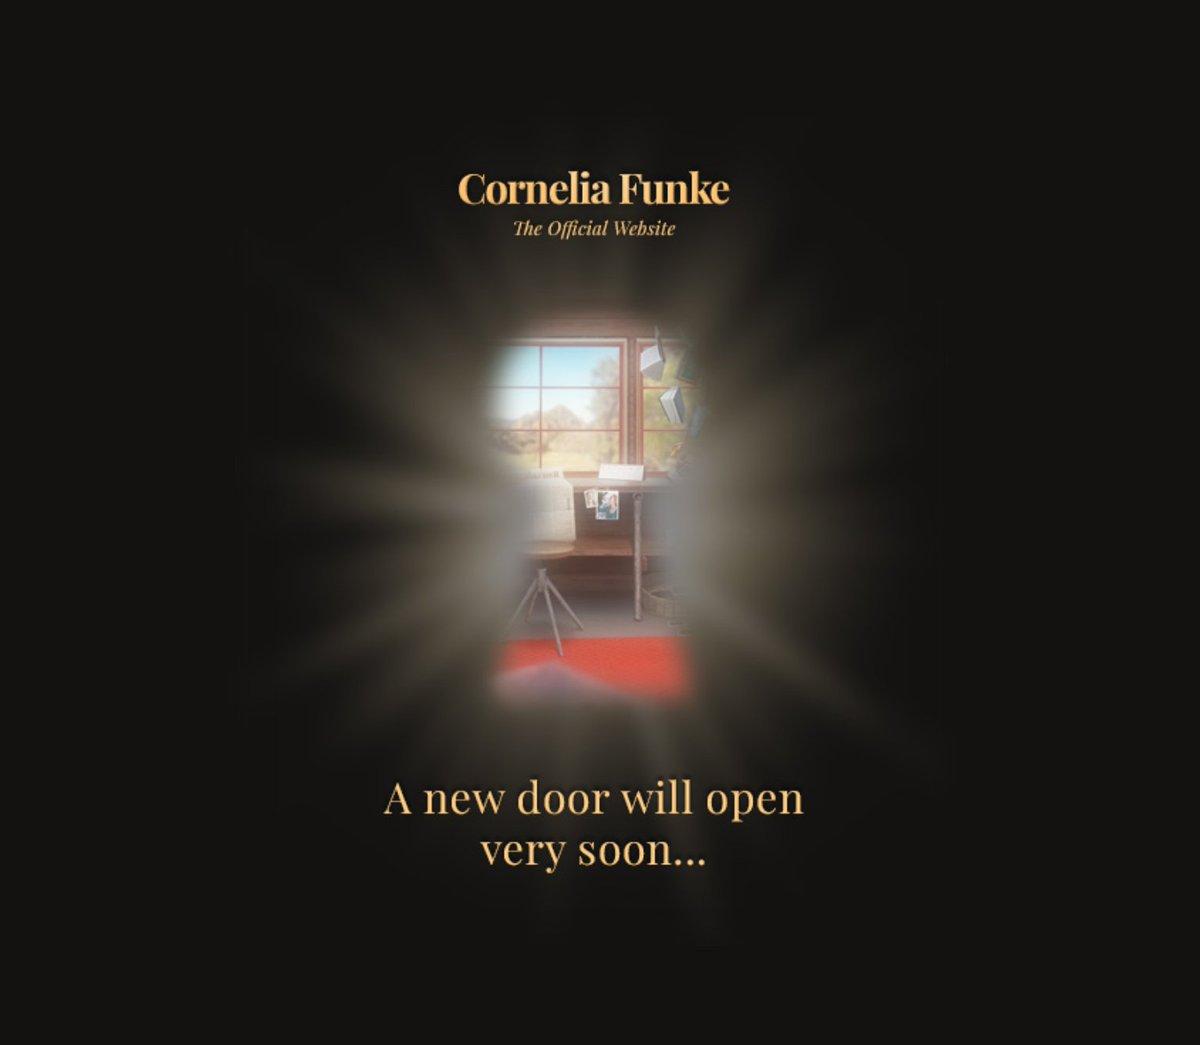 Cornelia Funke CorneliaFunke